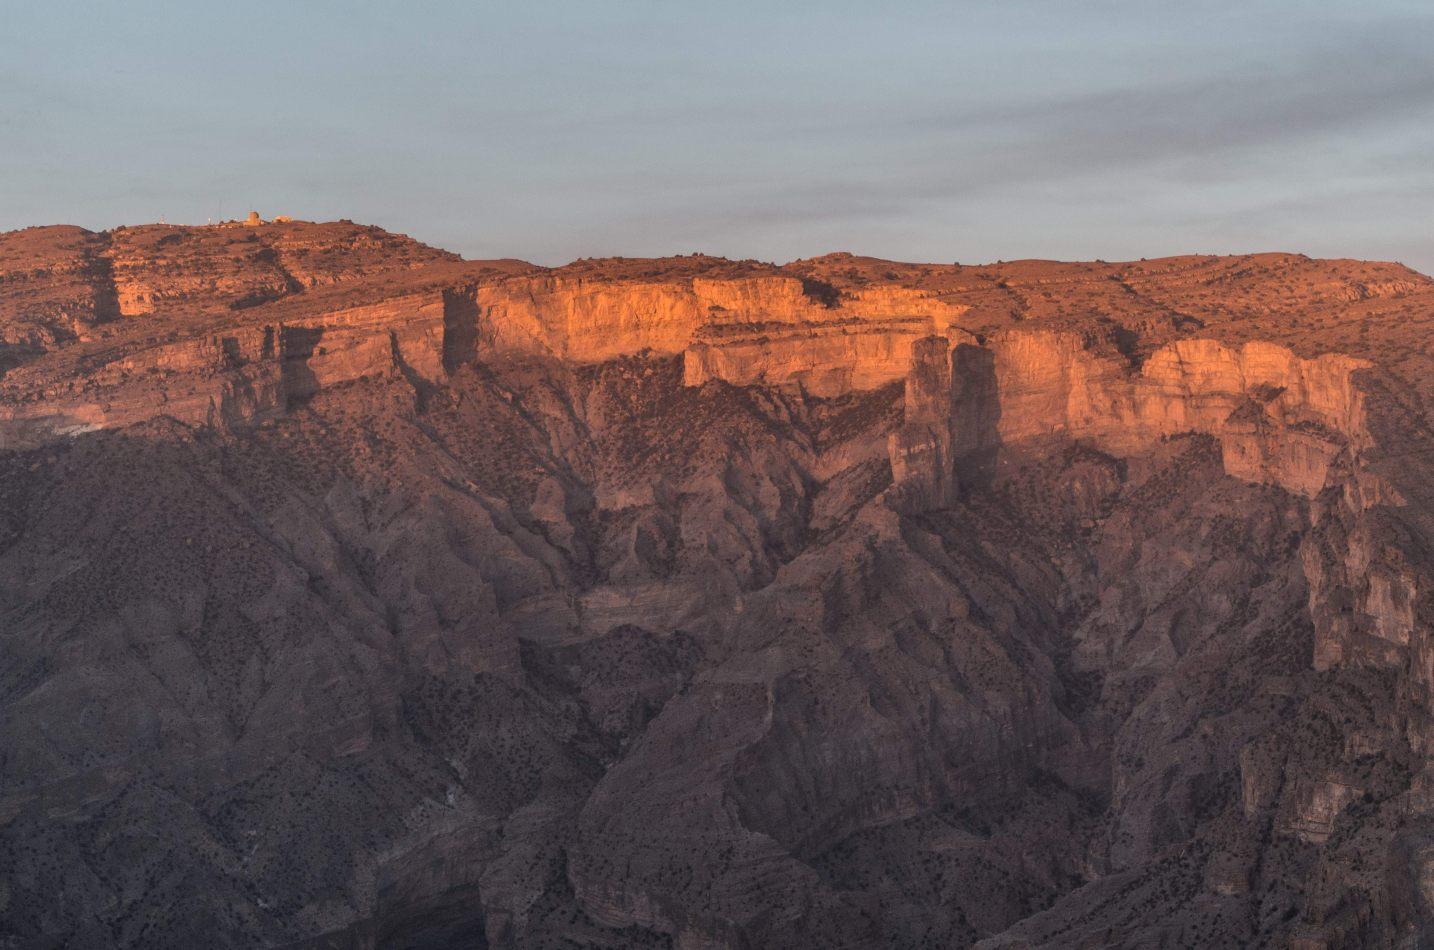 Hibiscus & Nomada : Oman - Djebel Shams